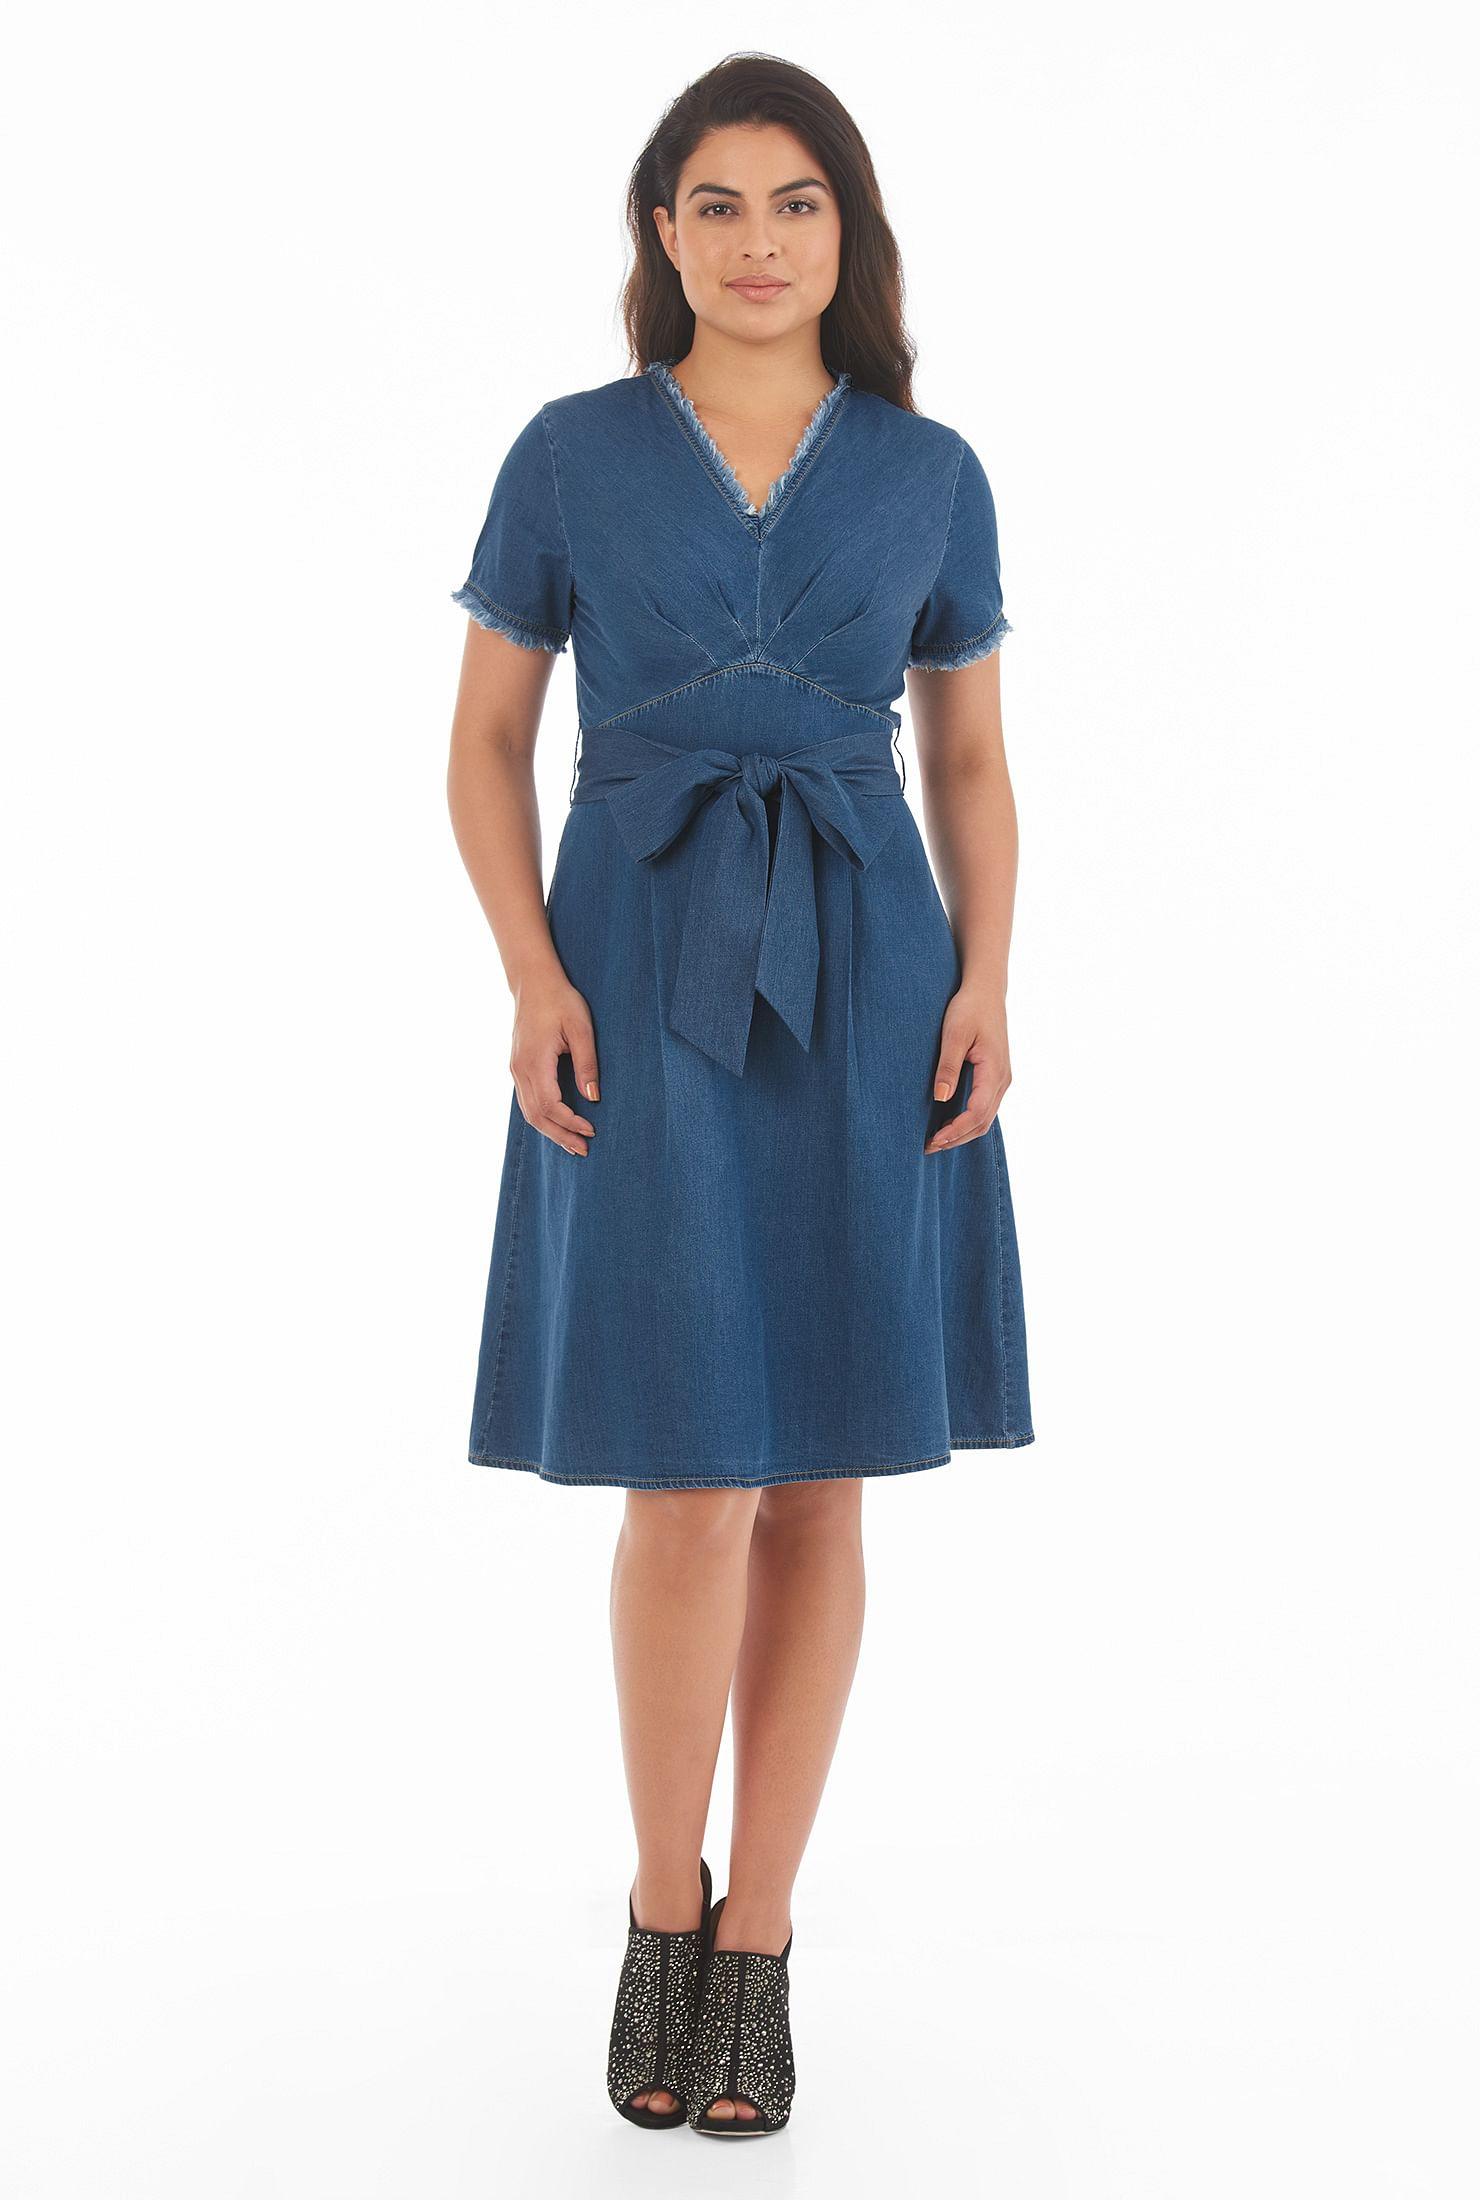 Cotton denim sash tie empire dress